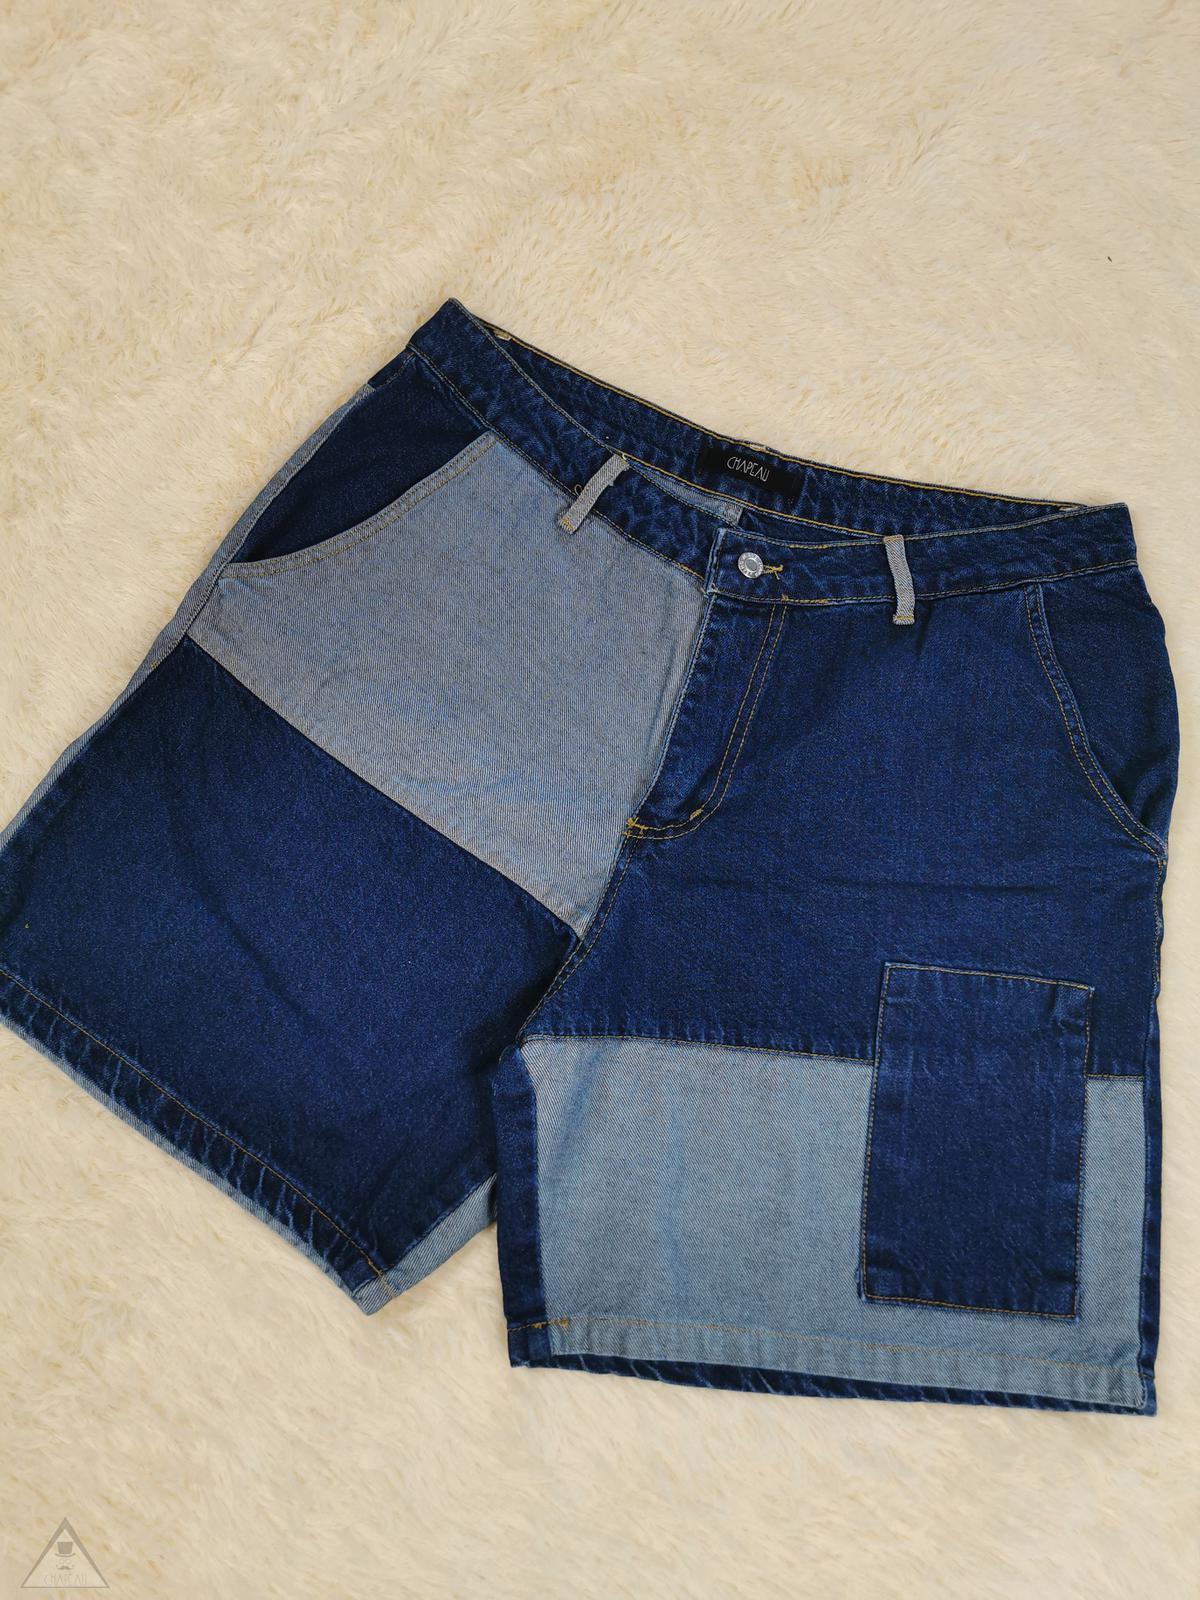 Bermuda Patchwork jeans